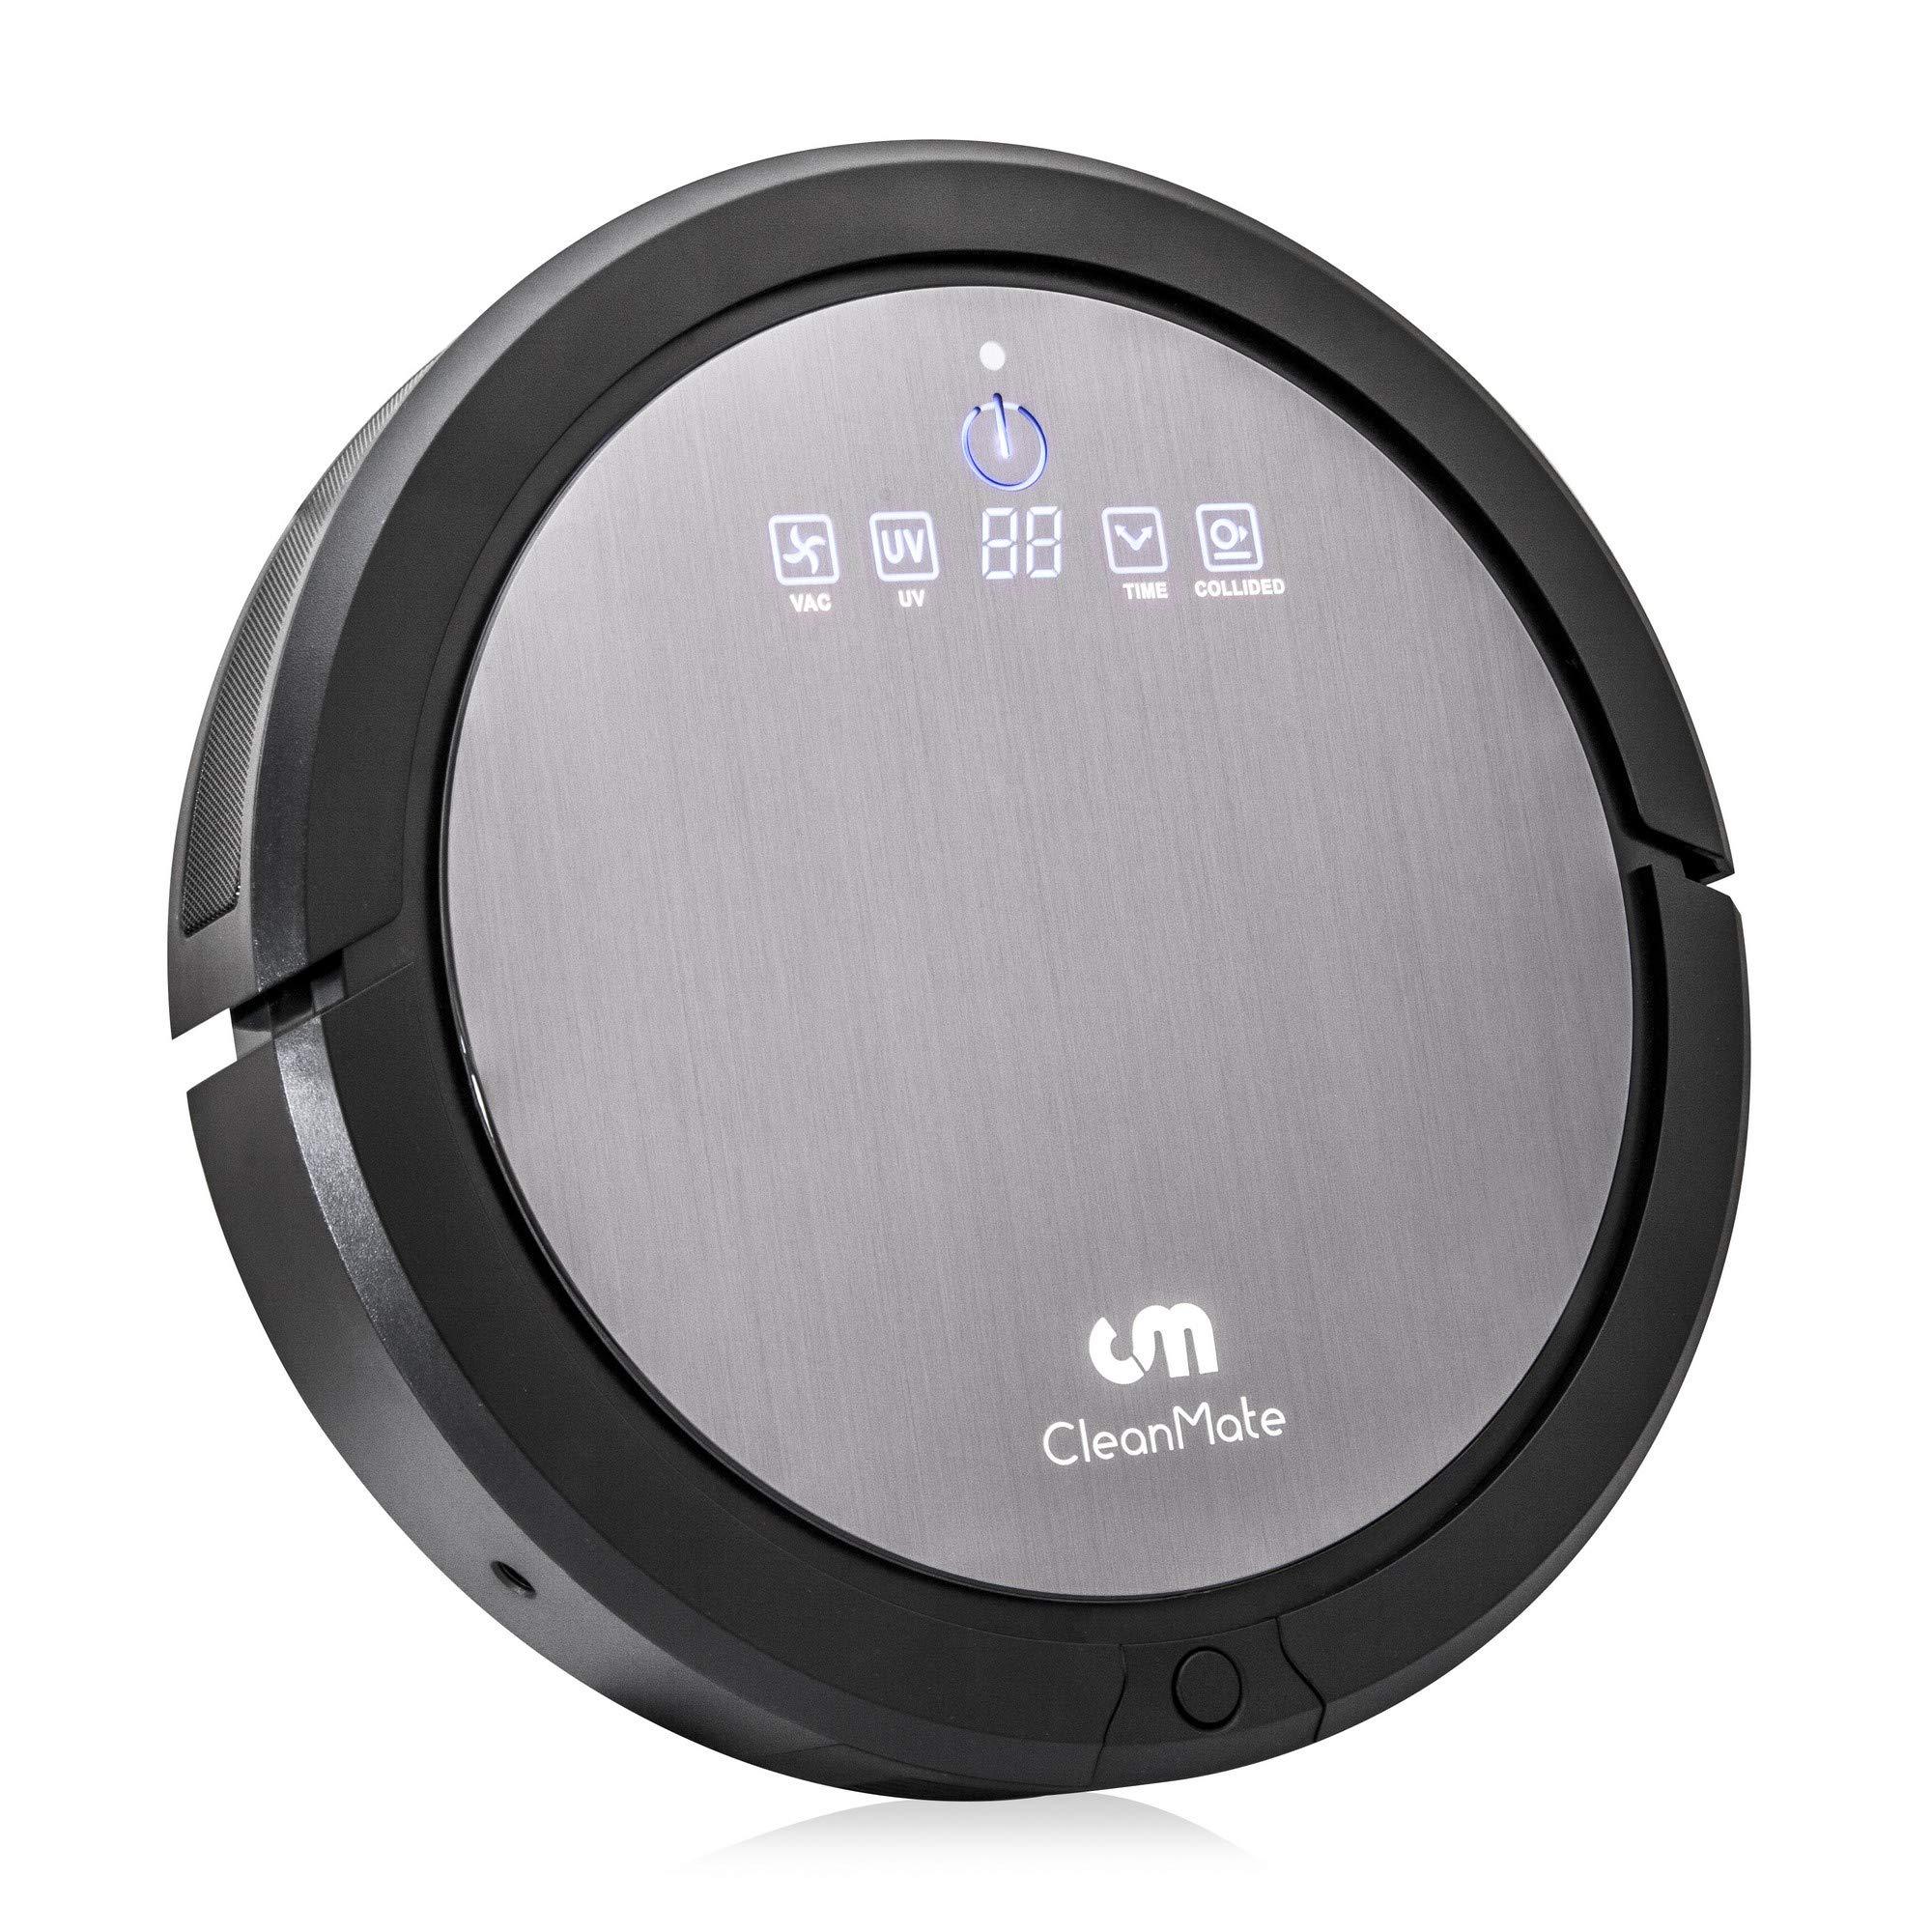 CleanMate CM3 Robot Vacuum Cleaner: Robotic Vacuum Cleaners for Carpet and Hardwood Floors